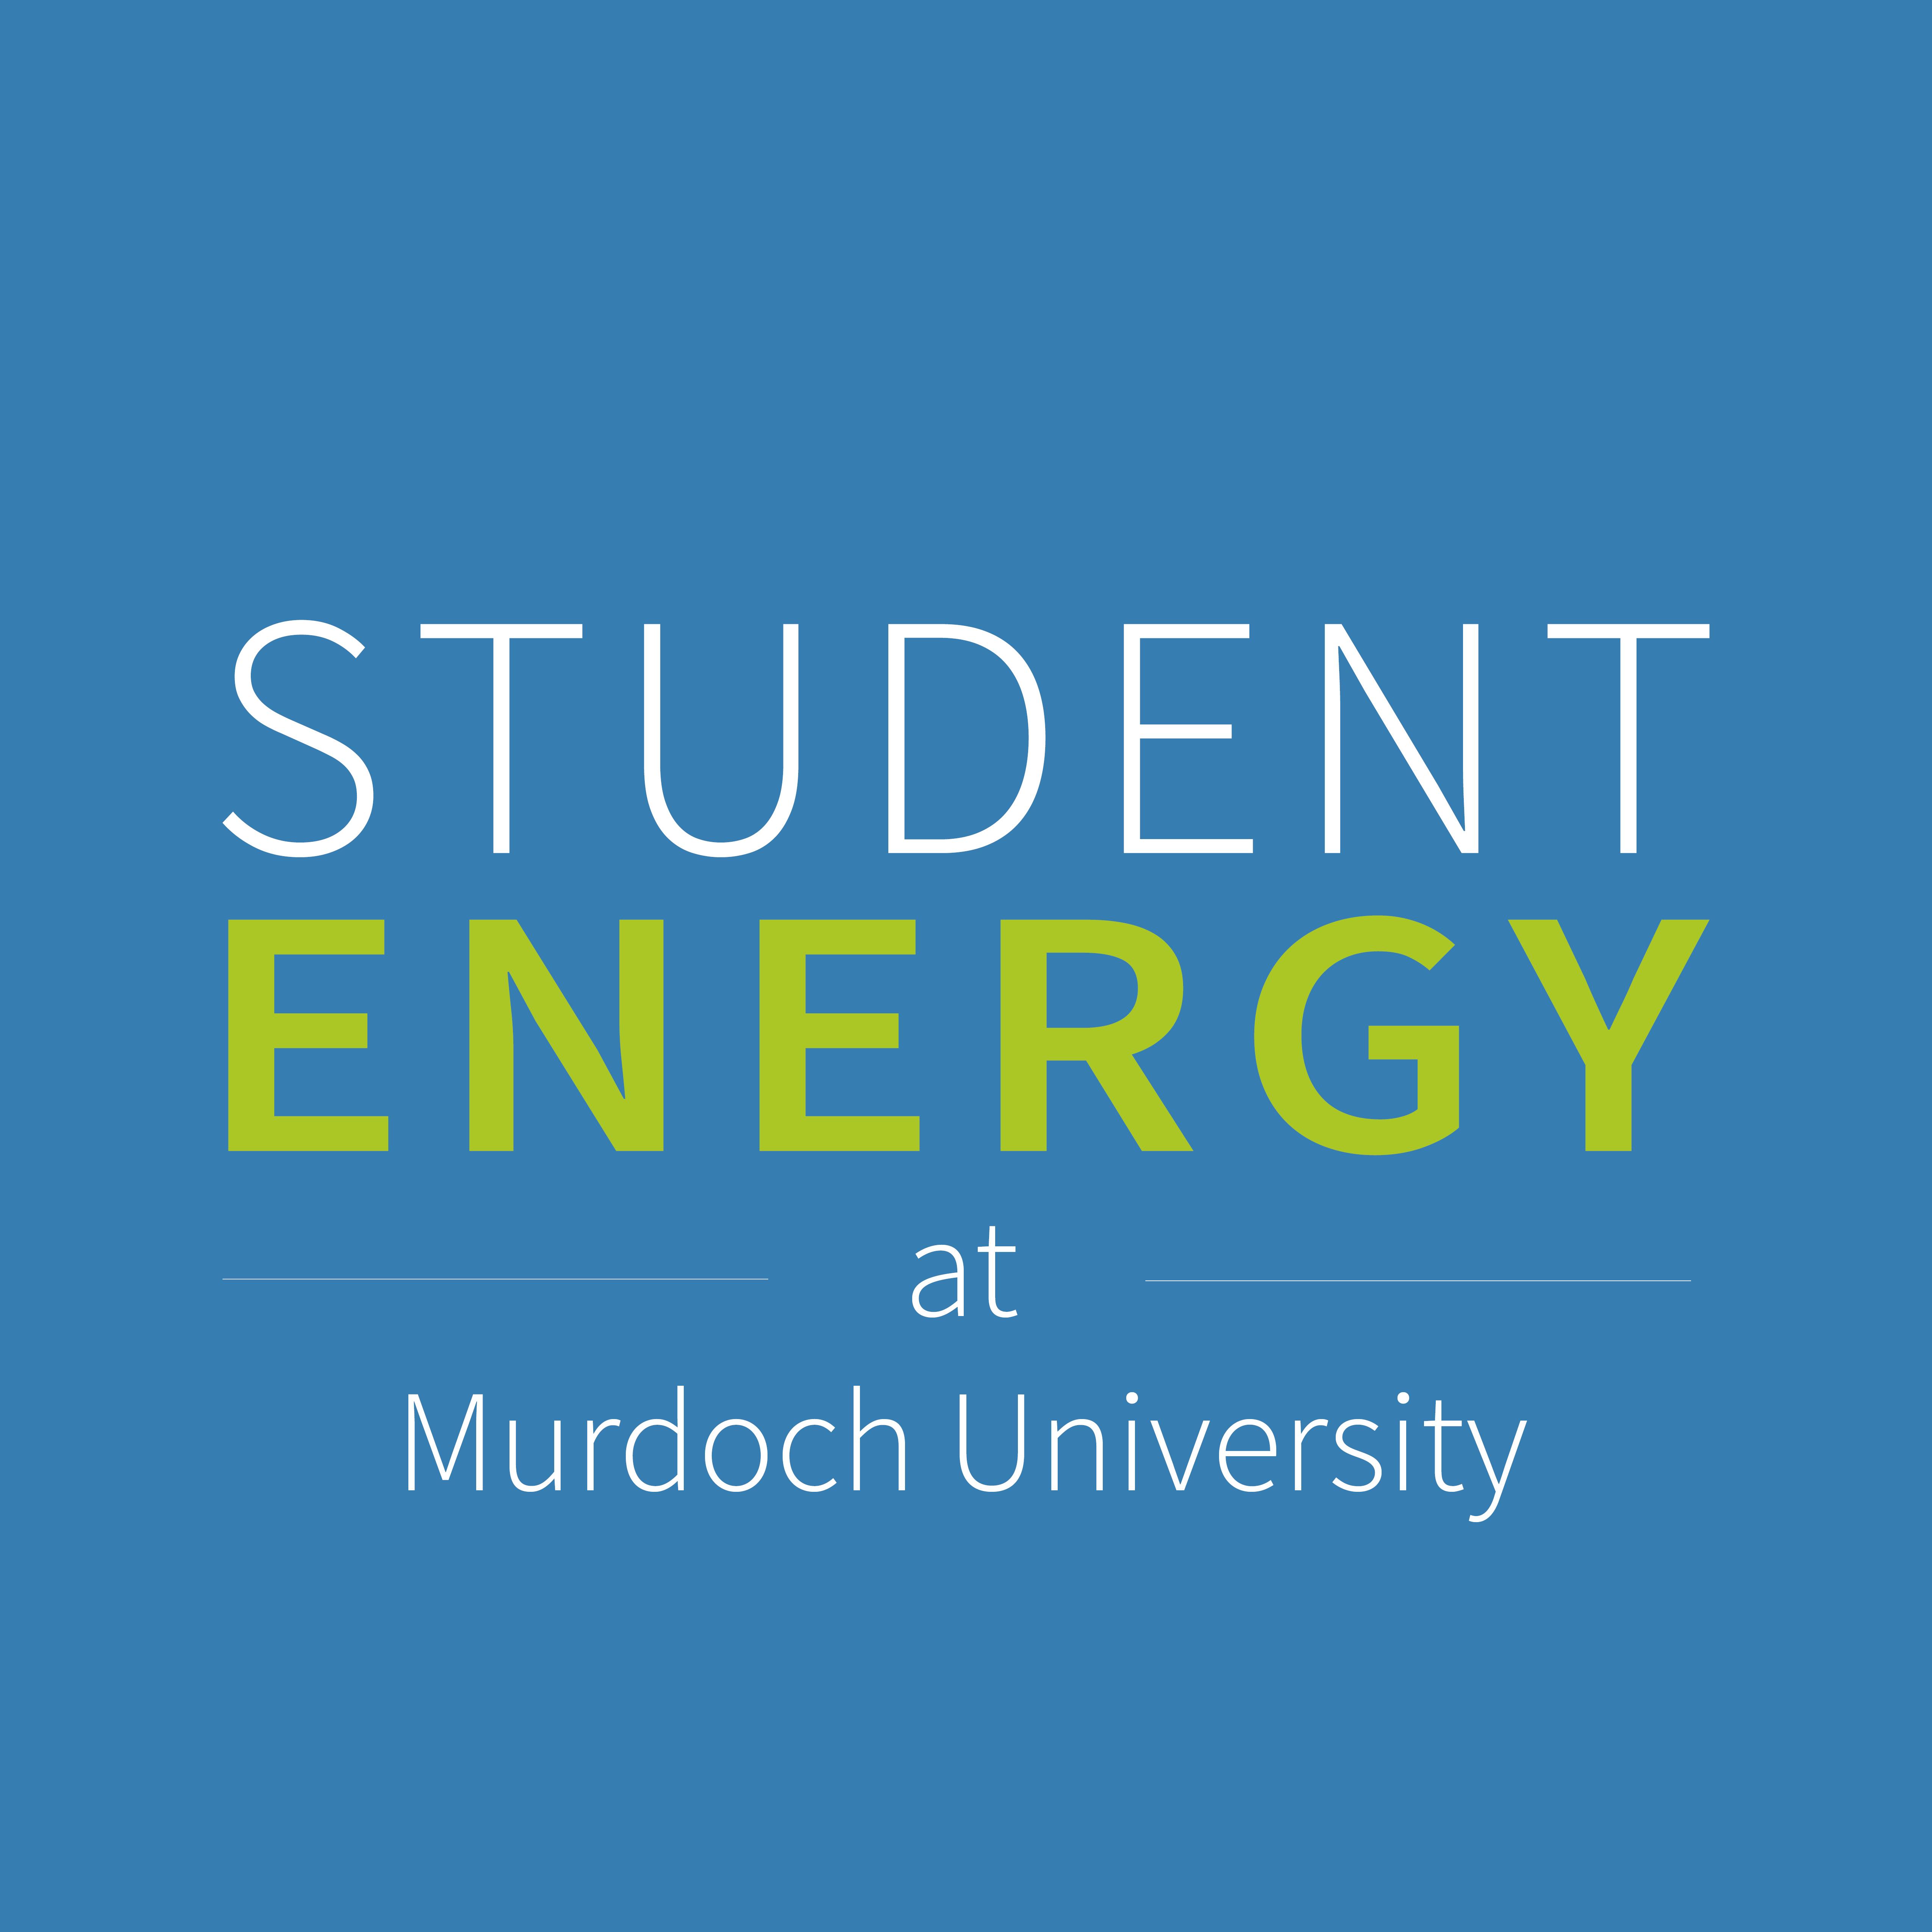 Murdoch University Logo.png